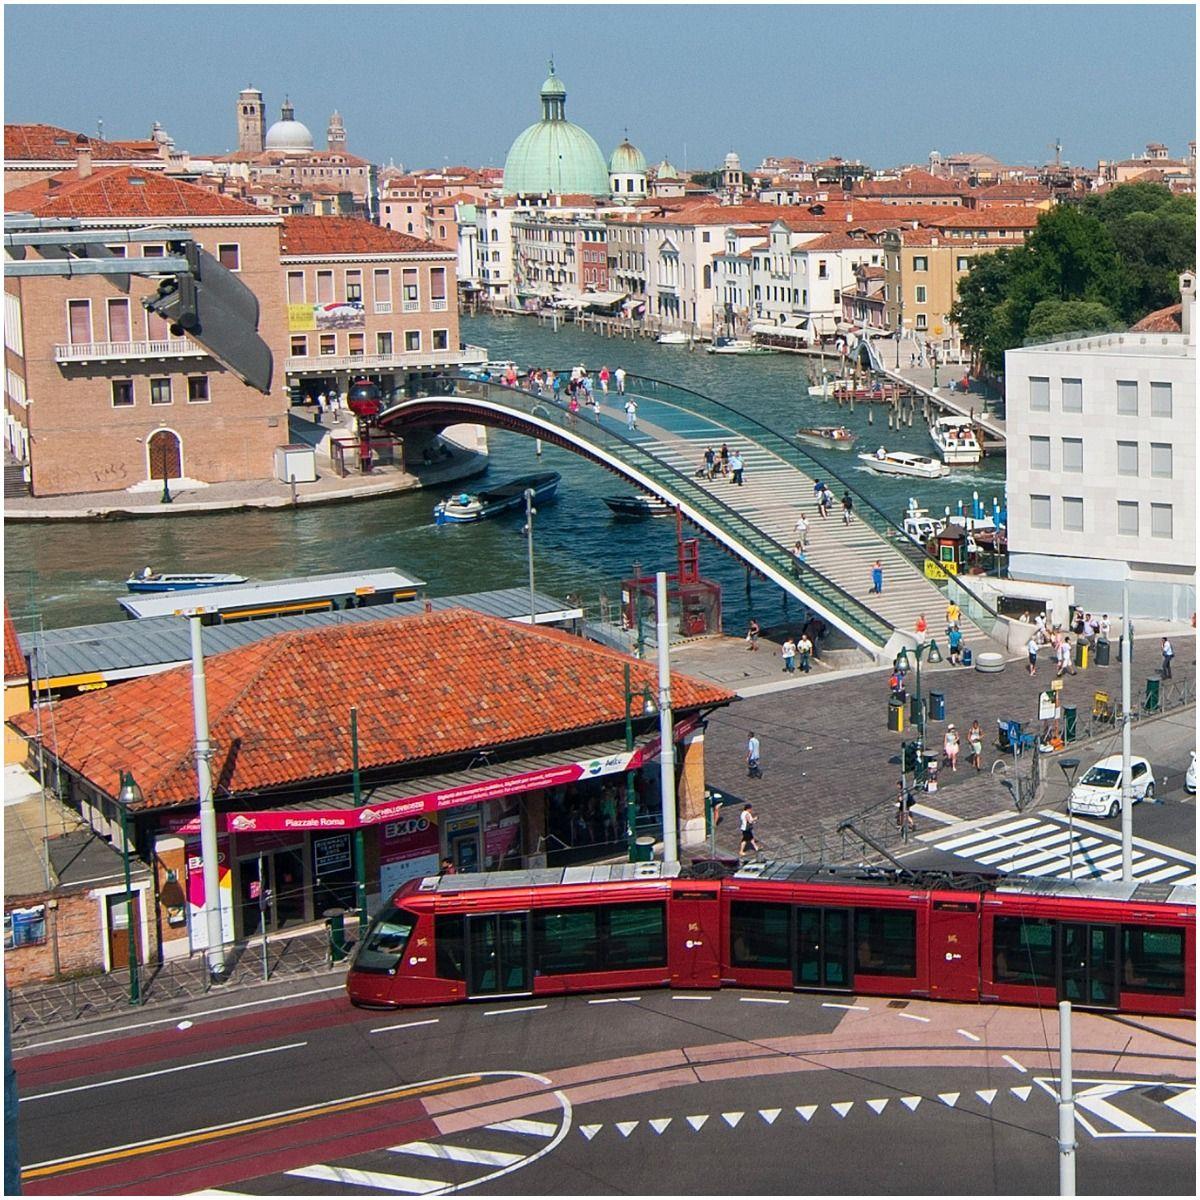 Calatrava bridge in Venice, Italy